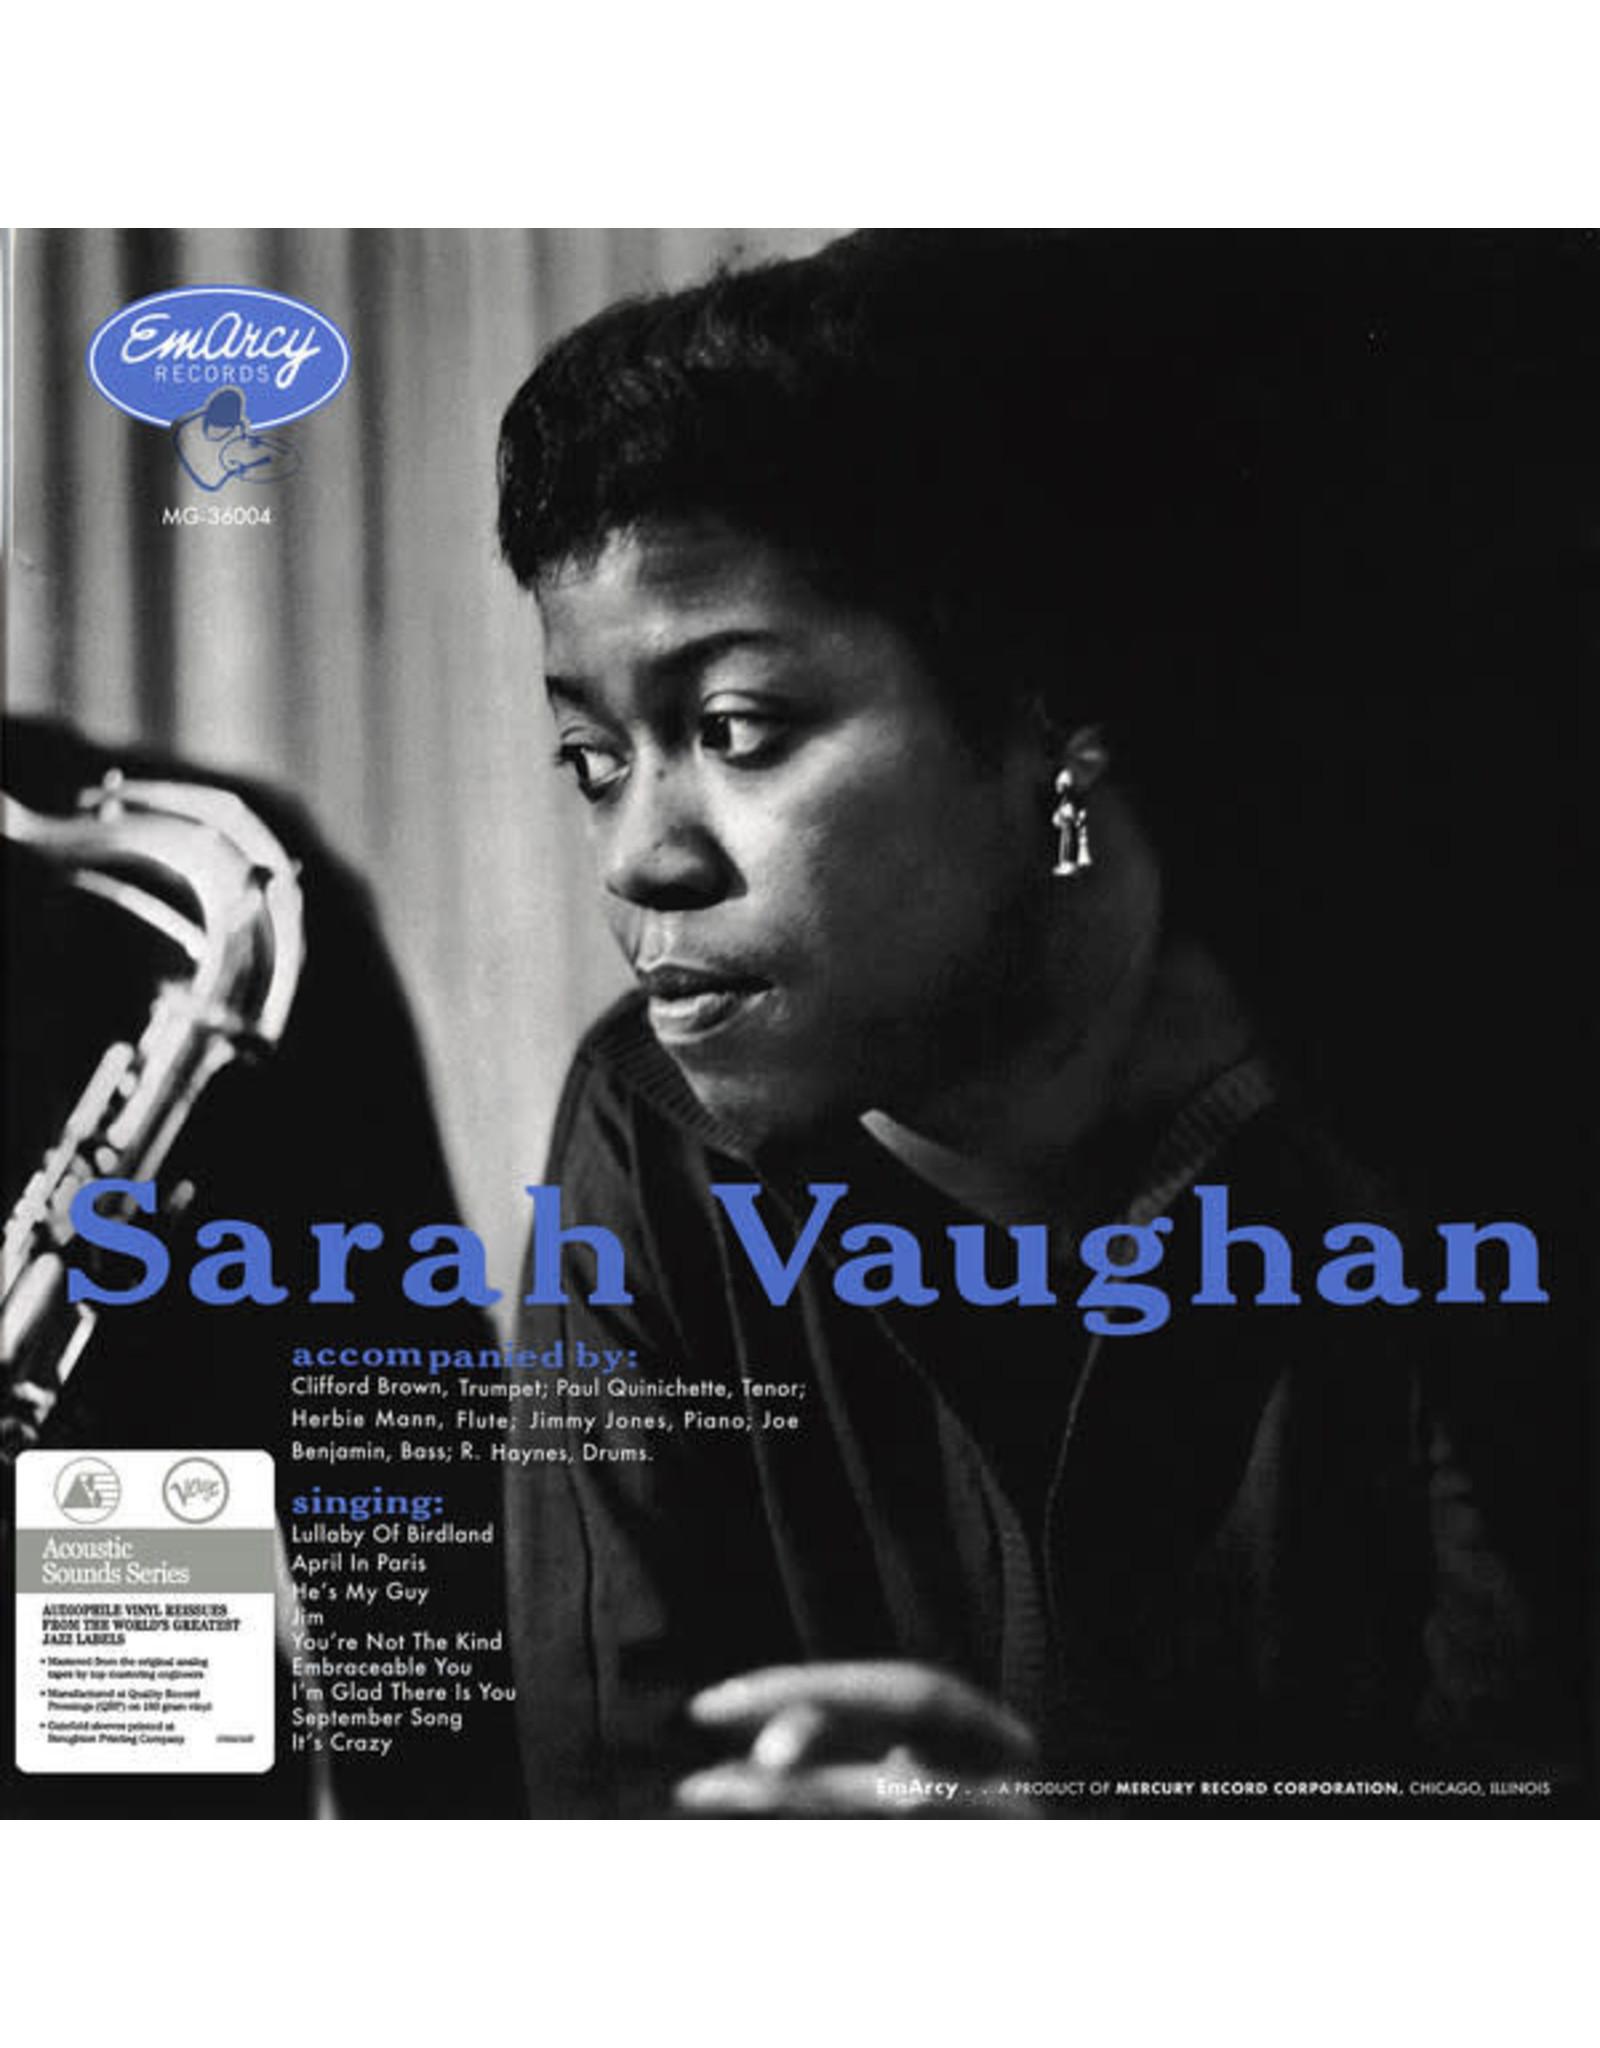 Vaughan, Sarah & Brown, Clifford - Sarah Vaughan (Acoustic Sounds Series) LPan (